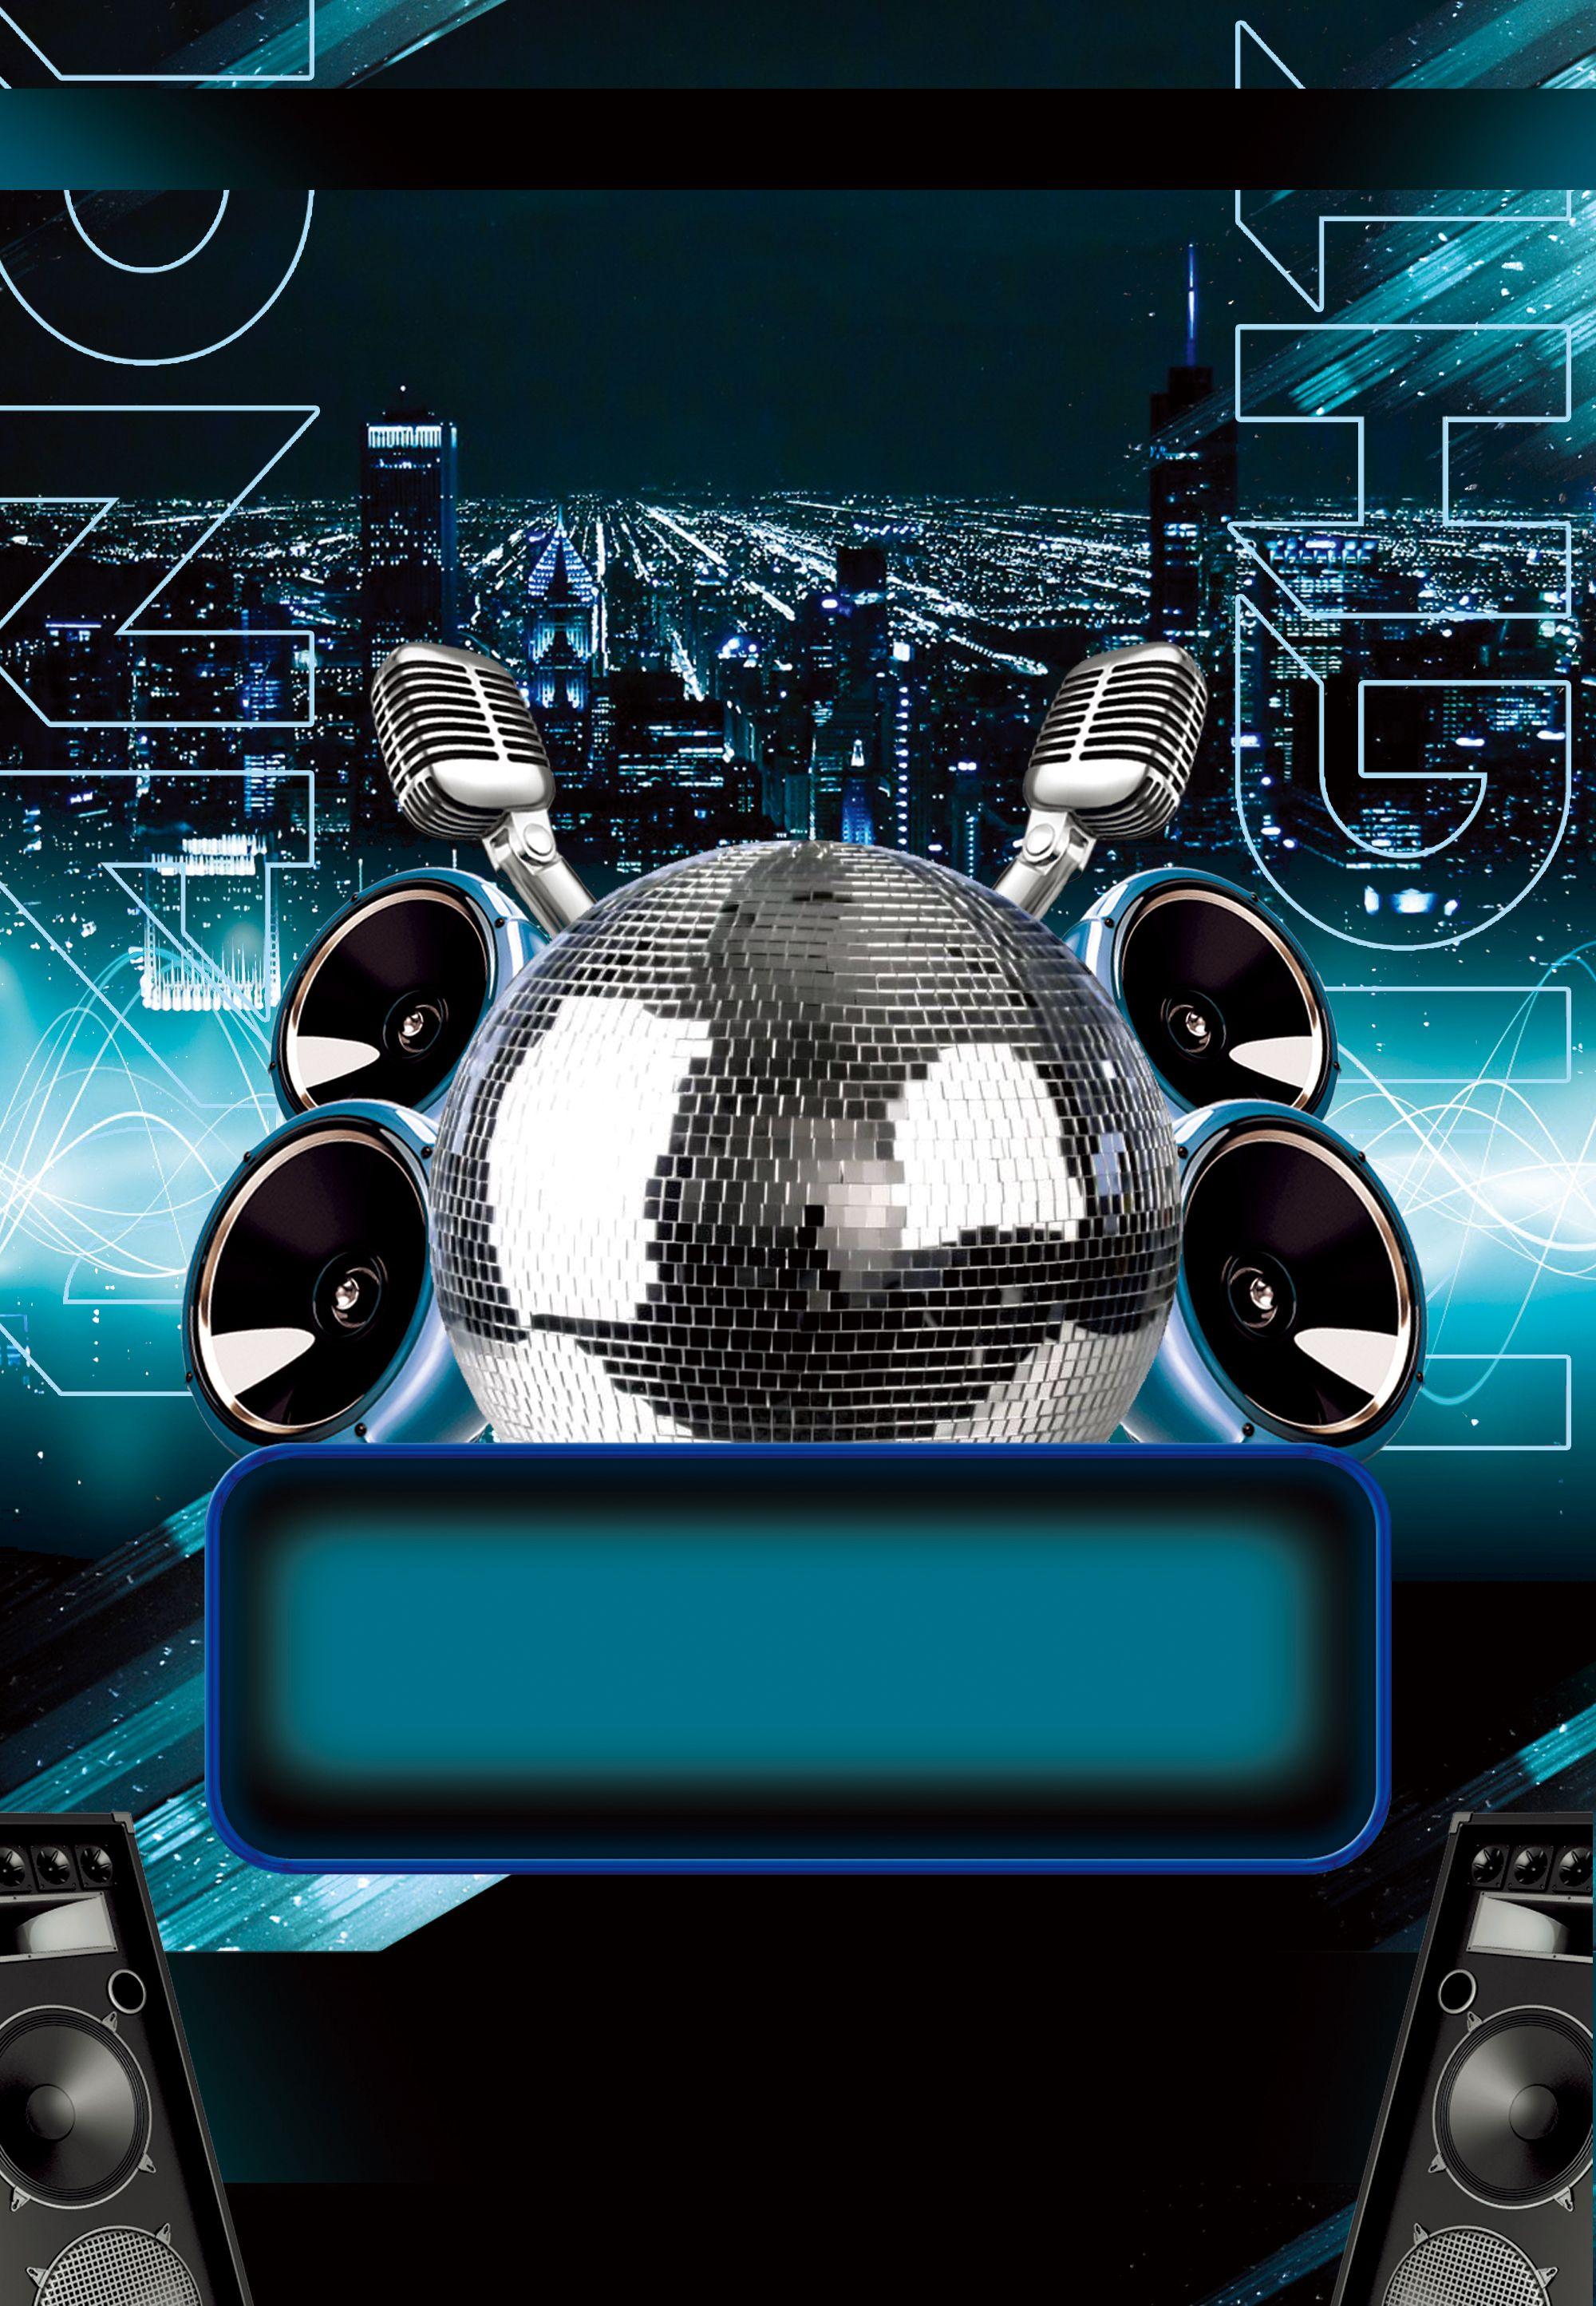 Cool Creative Background Poster Creative Background Poster Background Design Dance Poster Design,Free T Shirt Design Maker